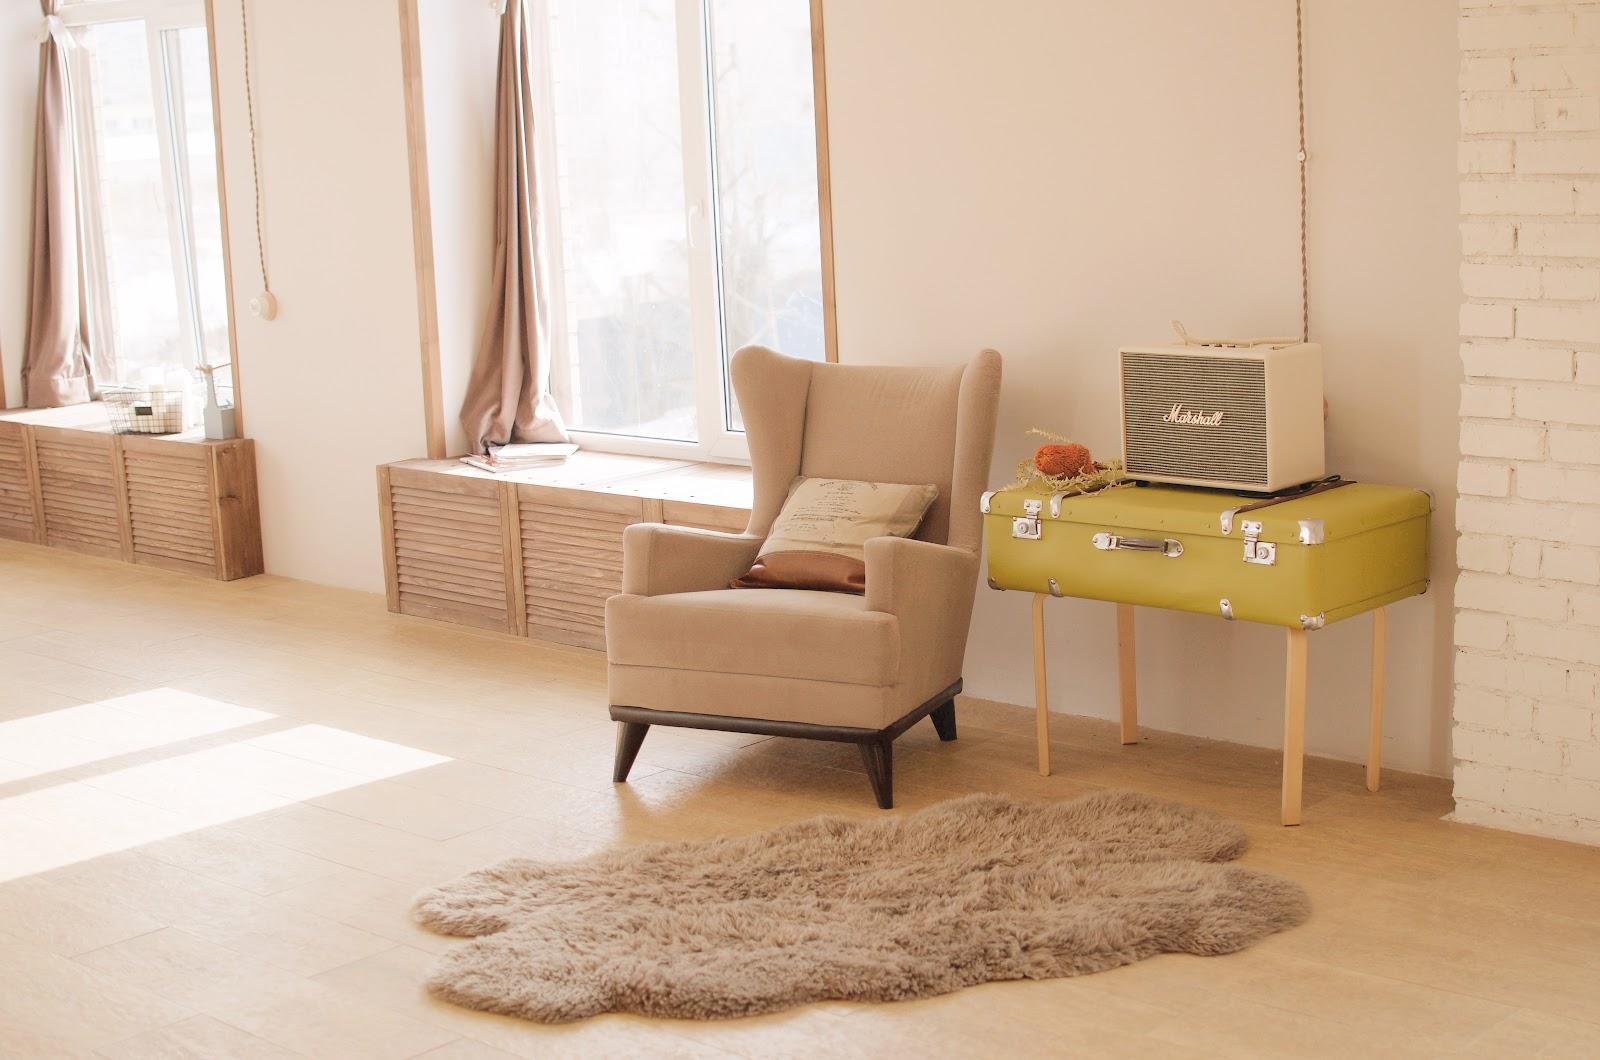 Unsur kayu pada desain scandinavian  - source: unsplash.com